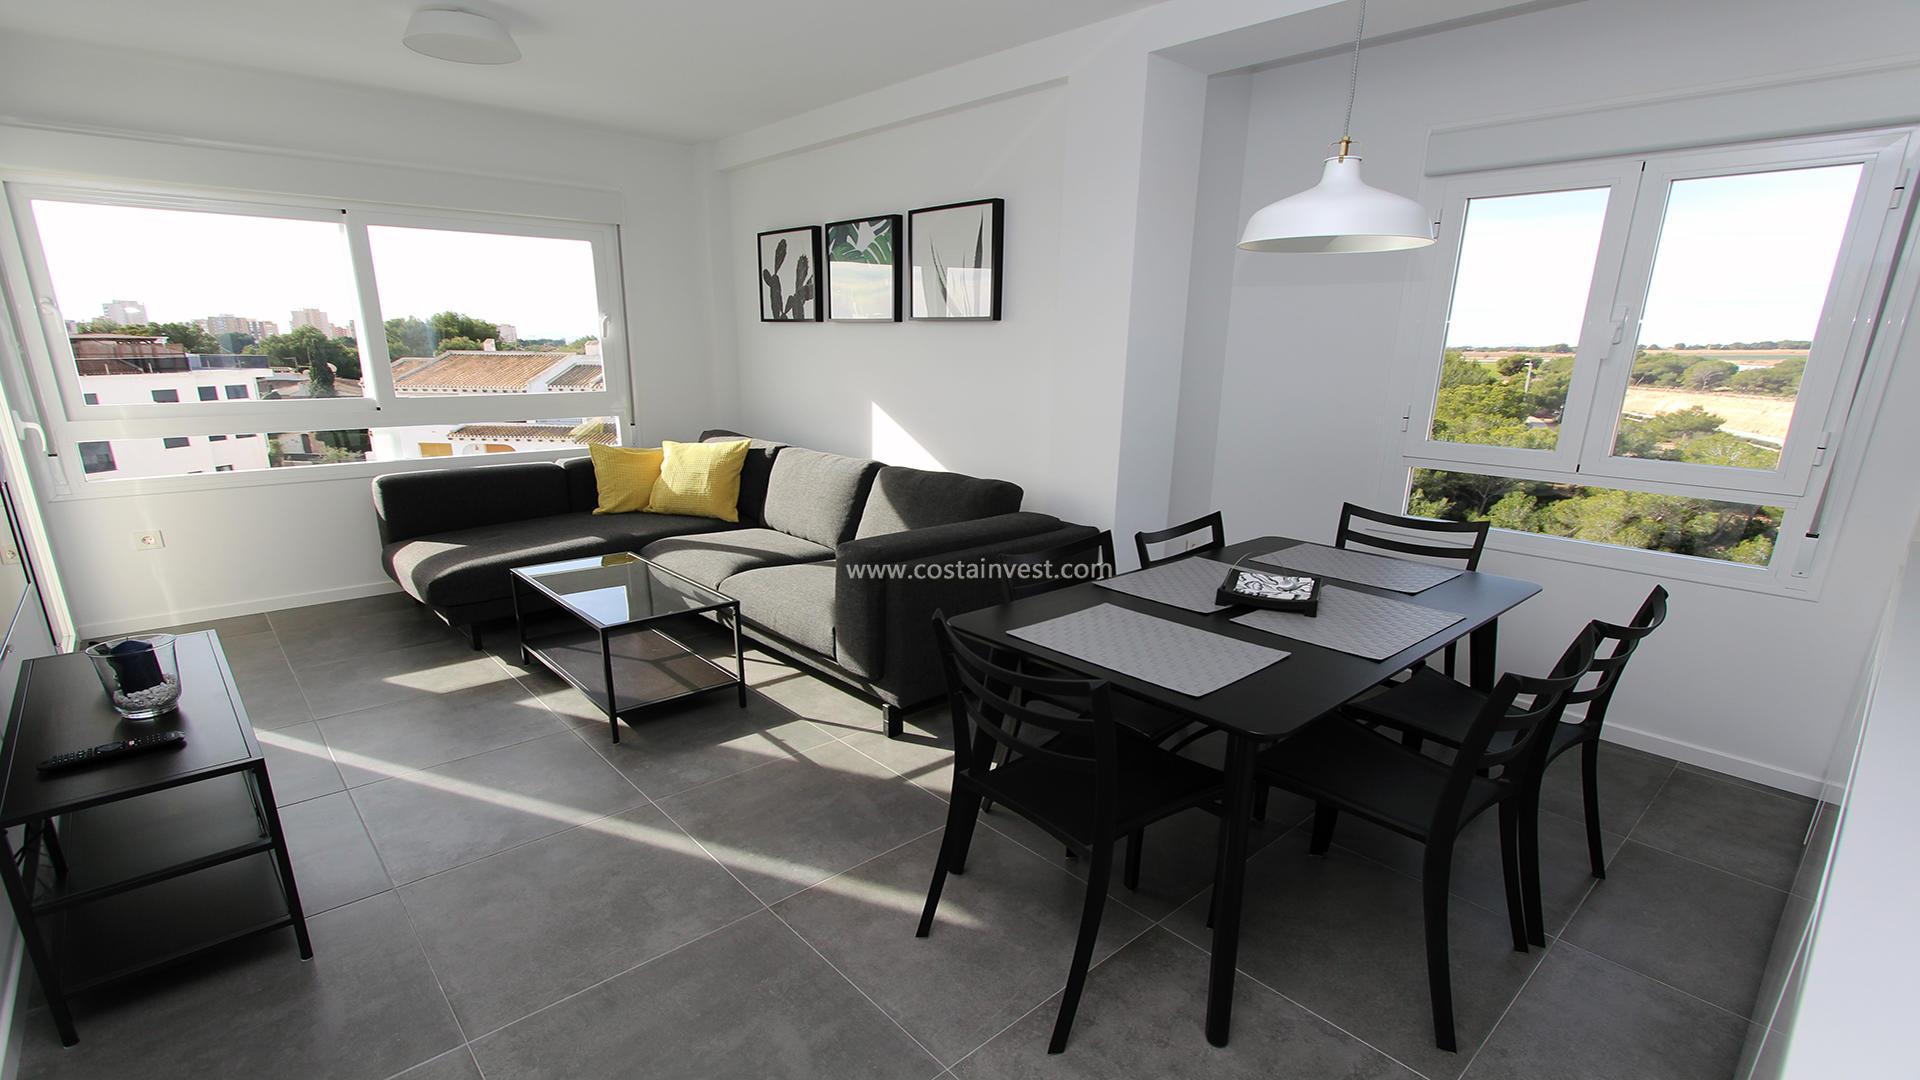 апартамент -                                       Orihuela Costa -                                       3 спальни -                                       5 человека